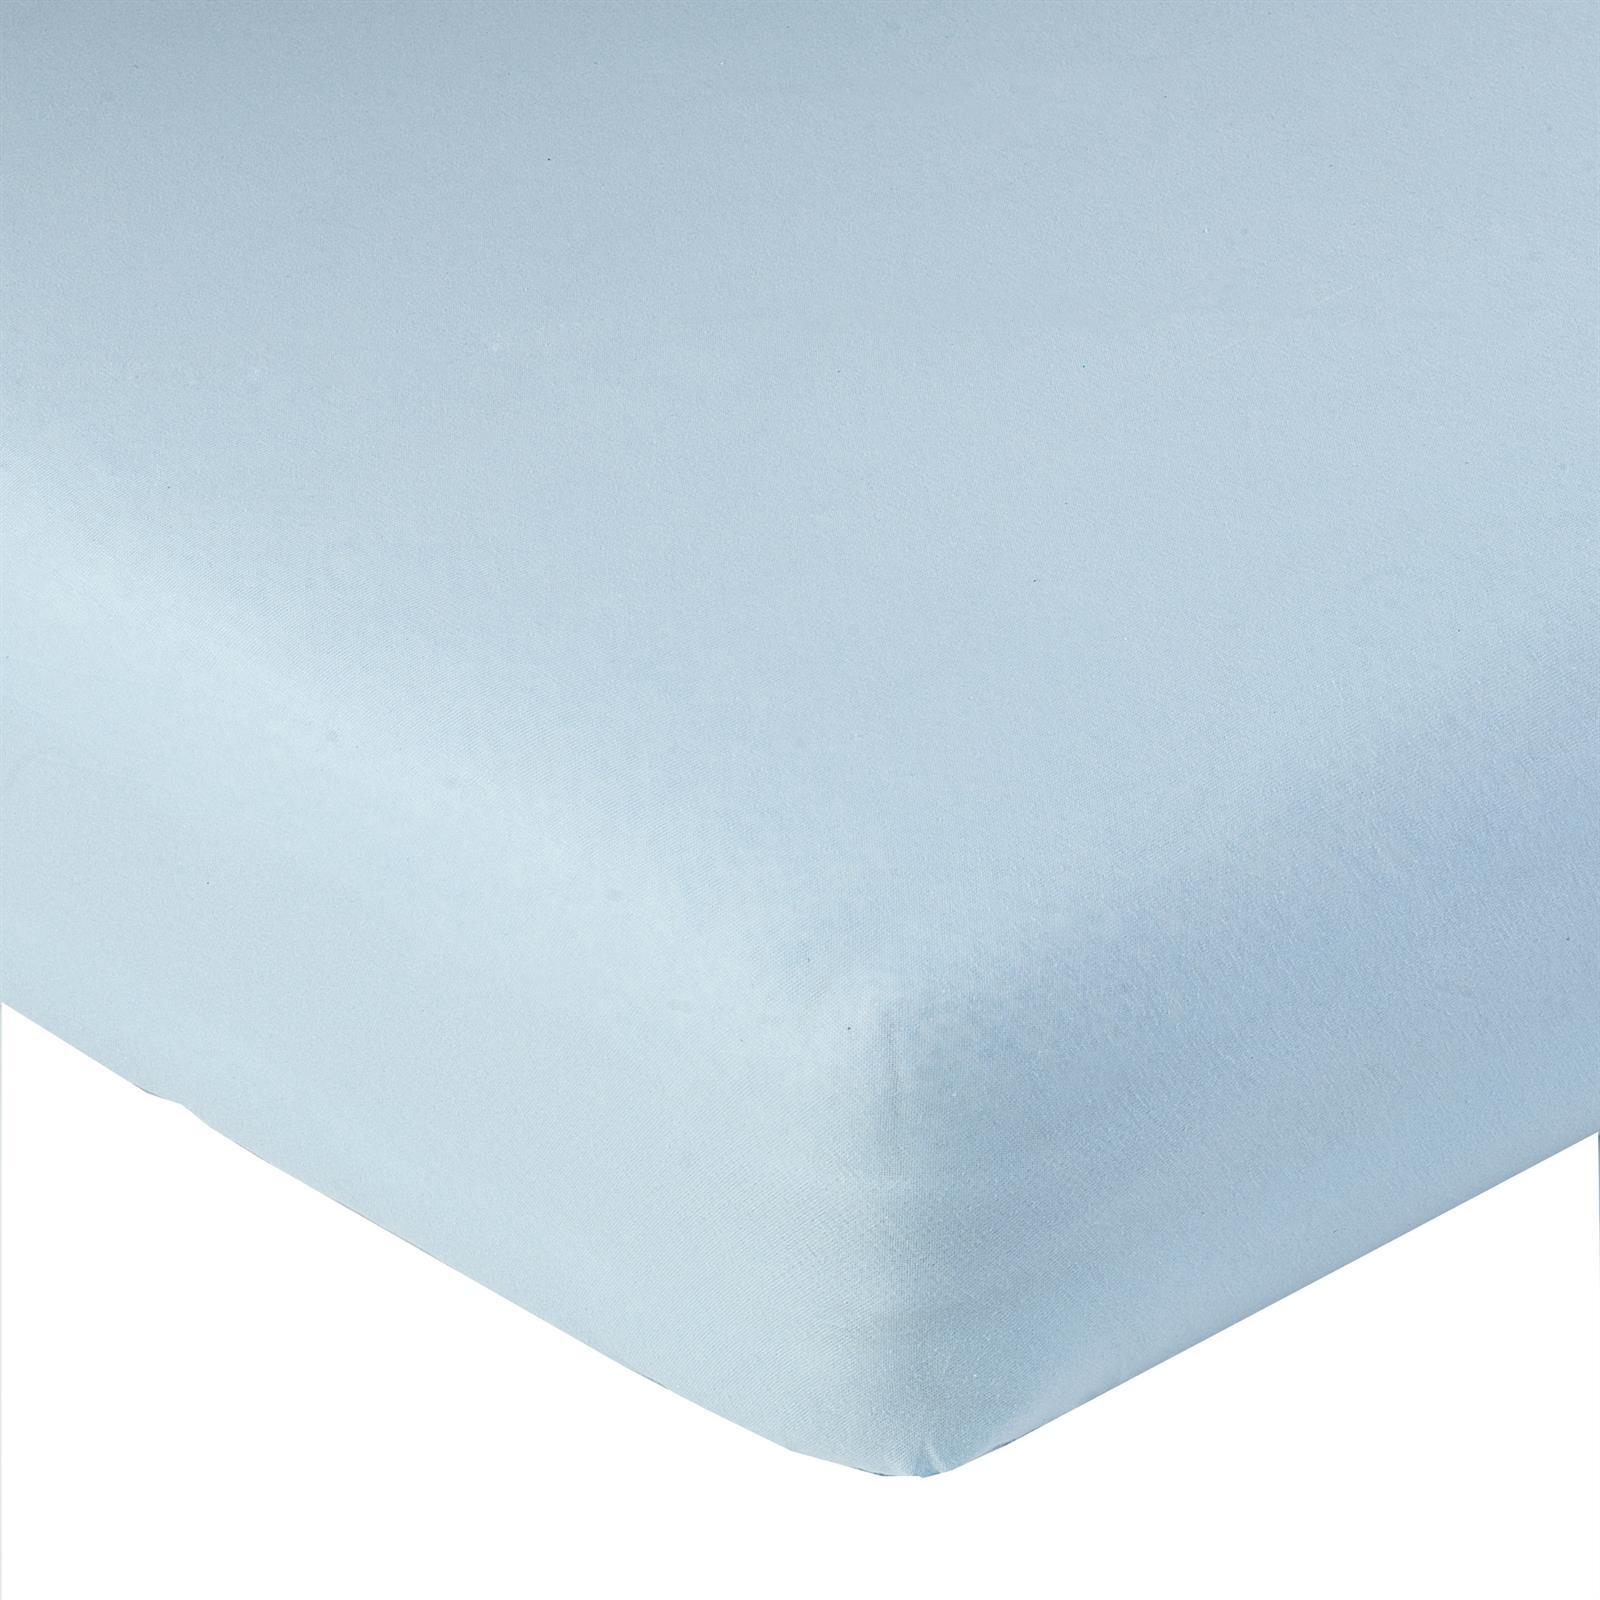 jersey spannbettlaken pia 180x200 cm hellblau caro m bel. Black Bedroom Furniture Sets. Home Design Ideas